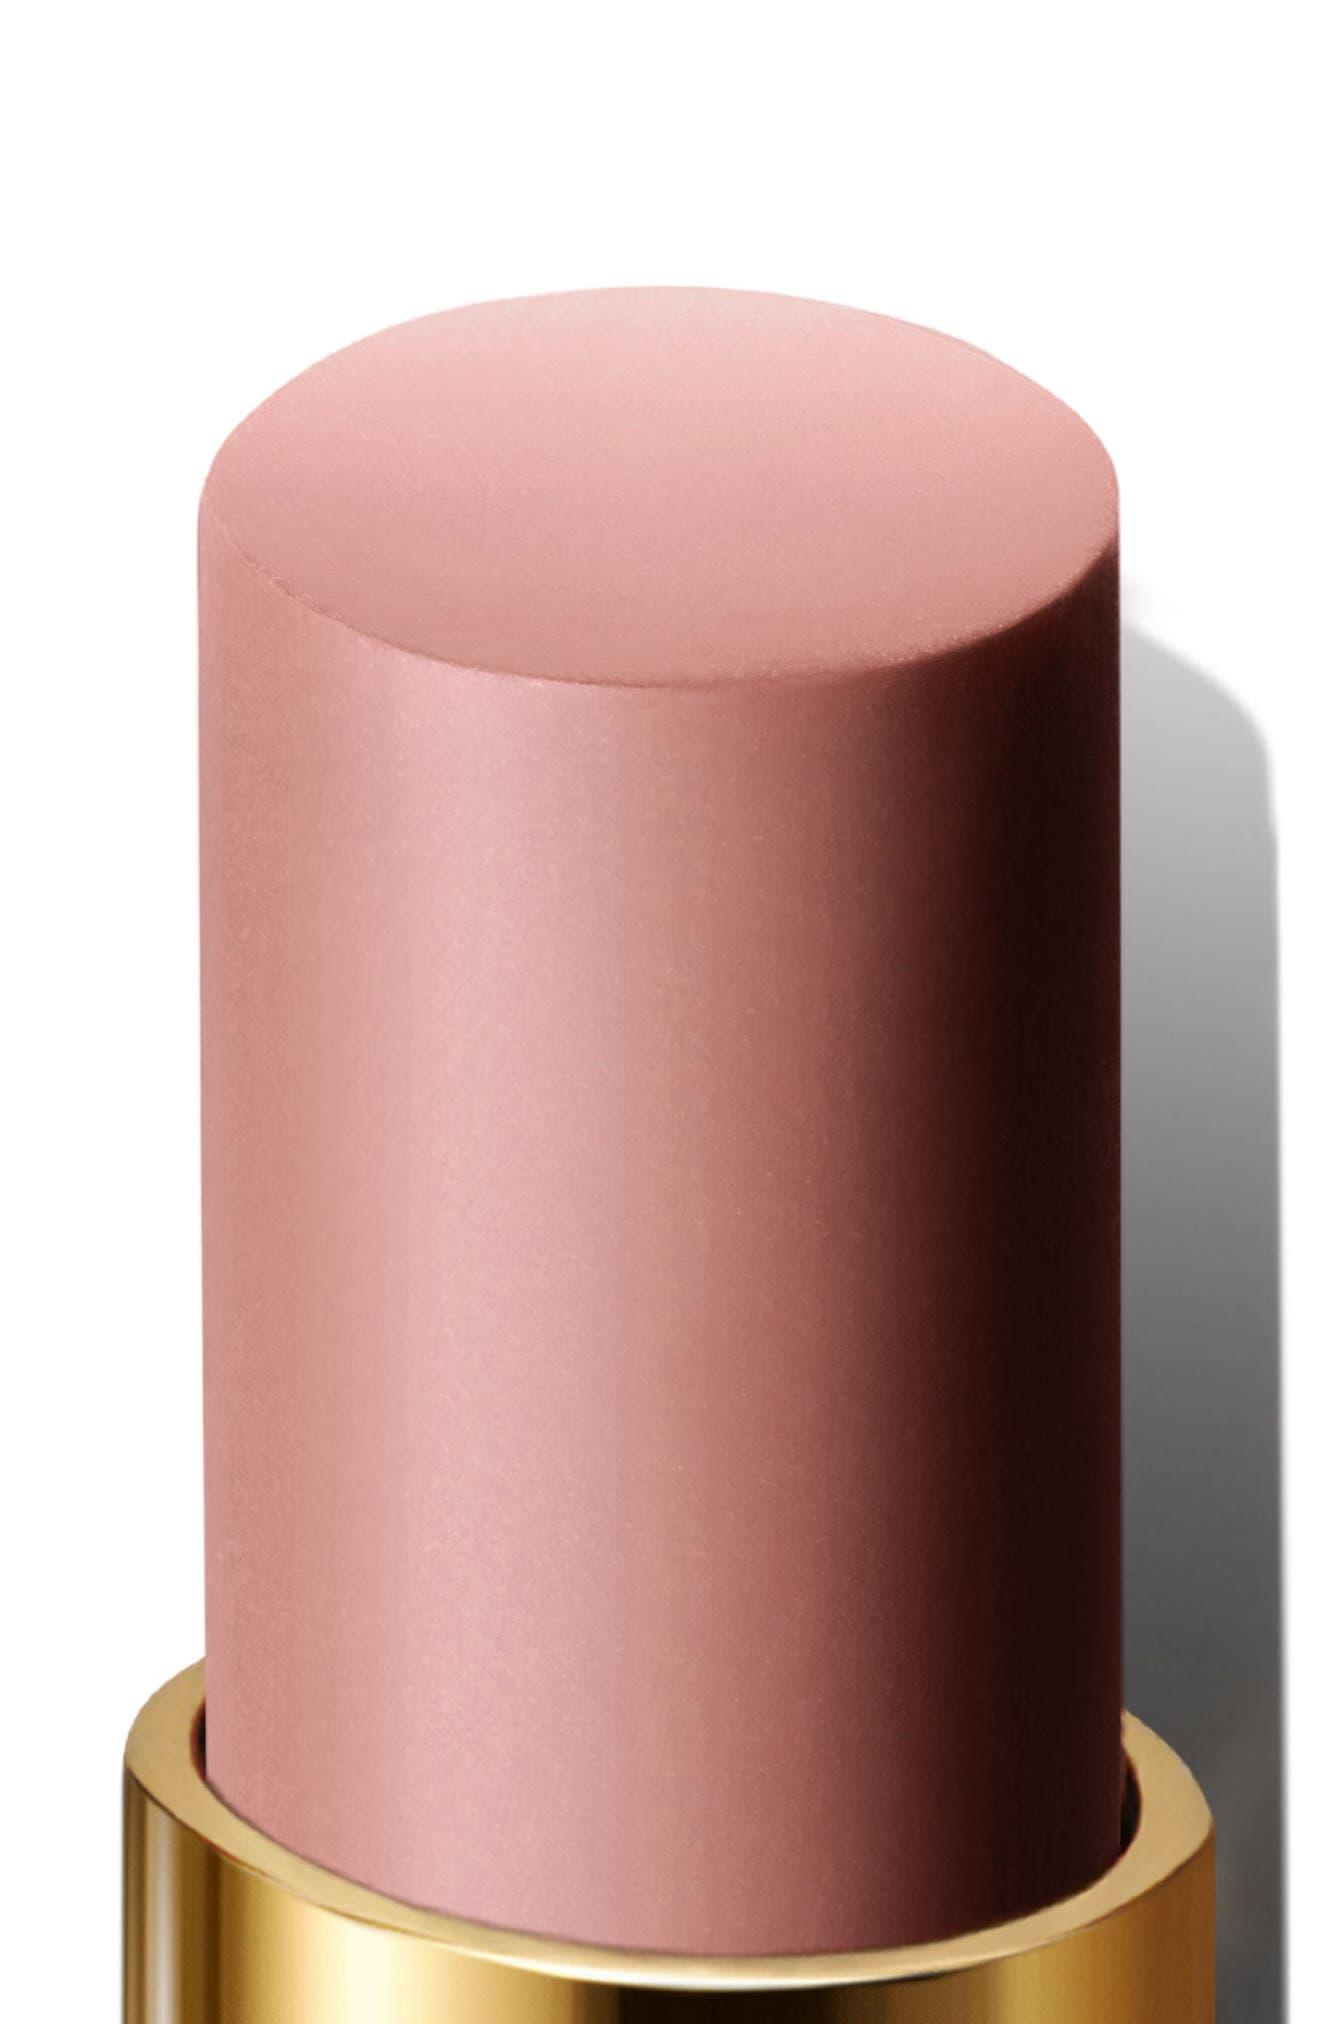 TOM FORD, Ultra-Shine Lip Color, Alternate thumbnail 3, color, BARE